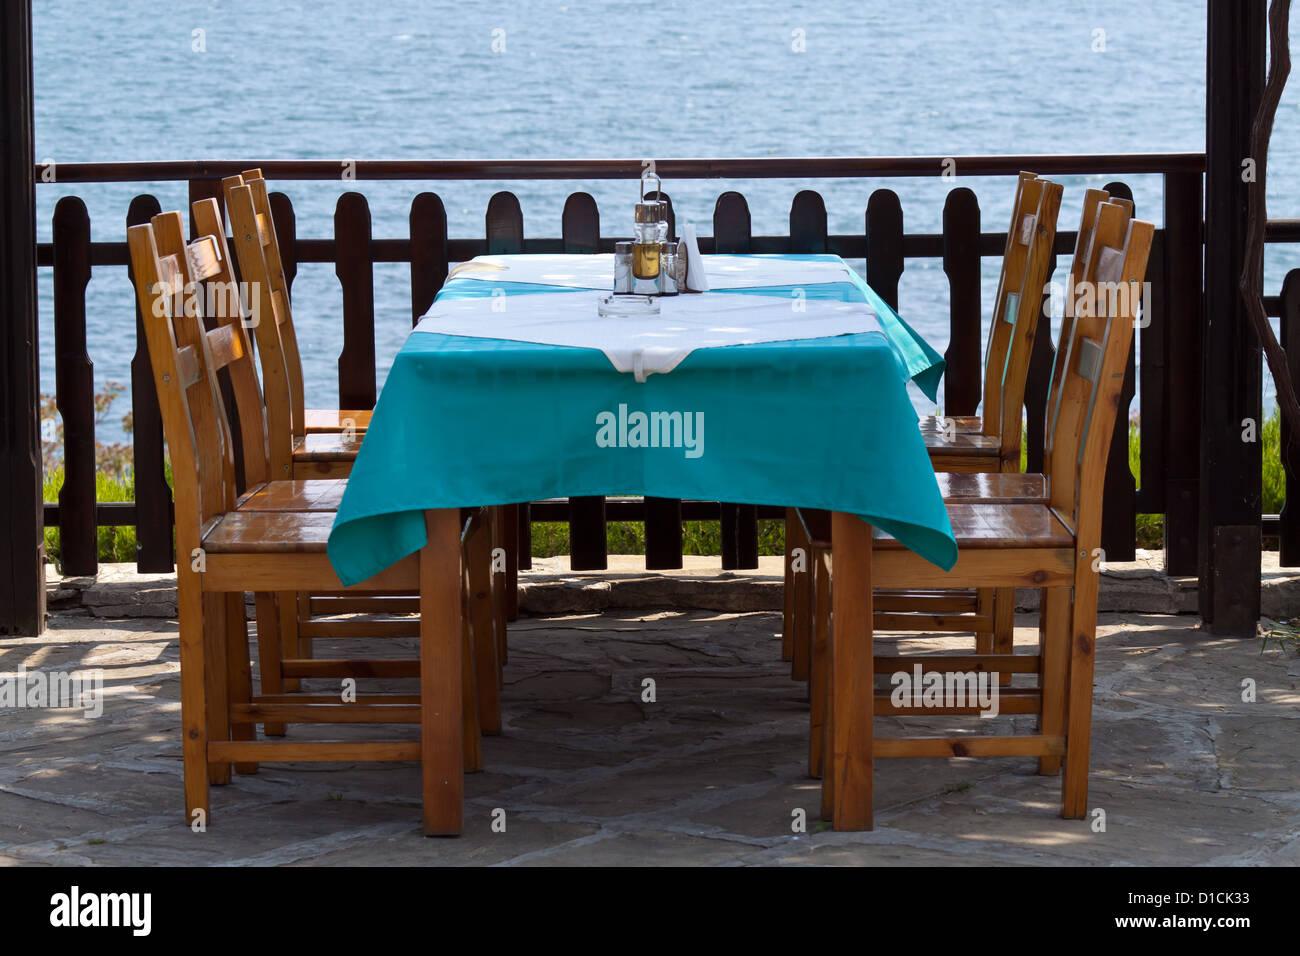 Restaurant Scenery in Nessebar, Bulgaria Stock Photo